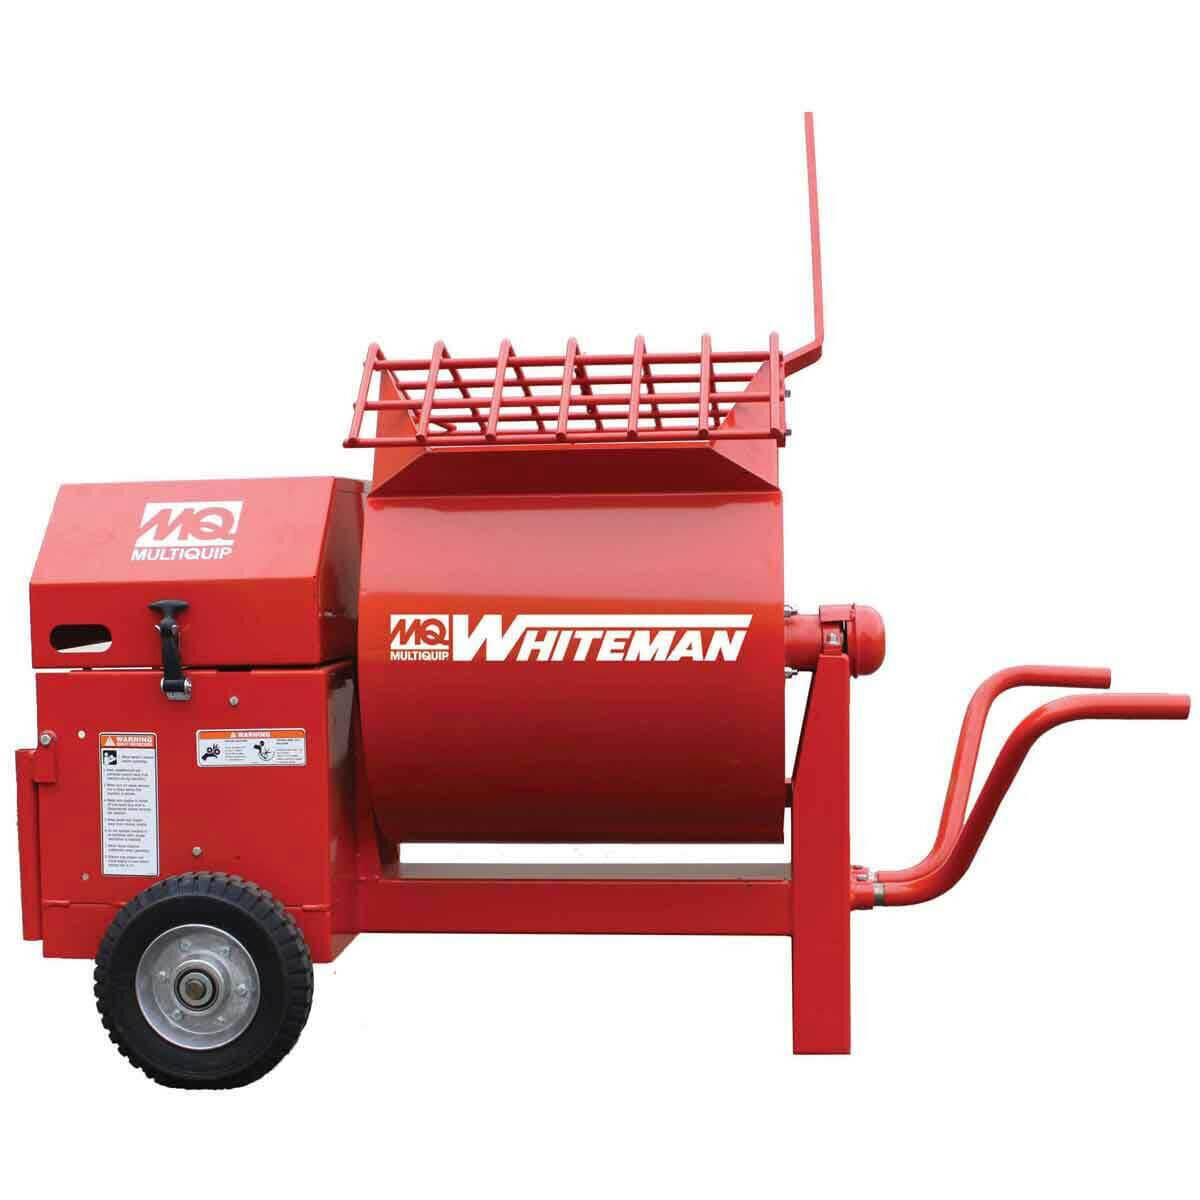 Whiteman Wheelbarrow Style Mixer Side